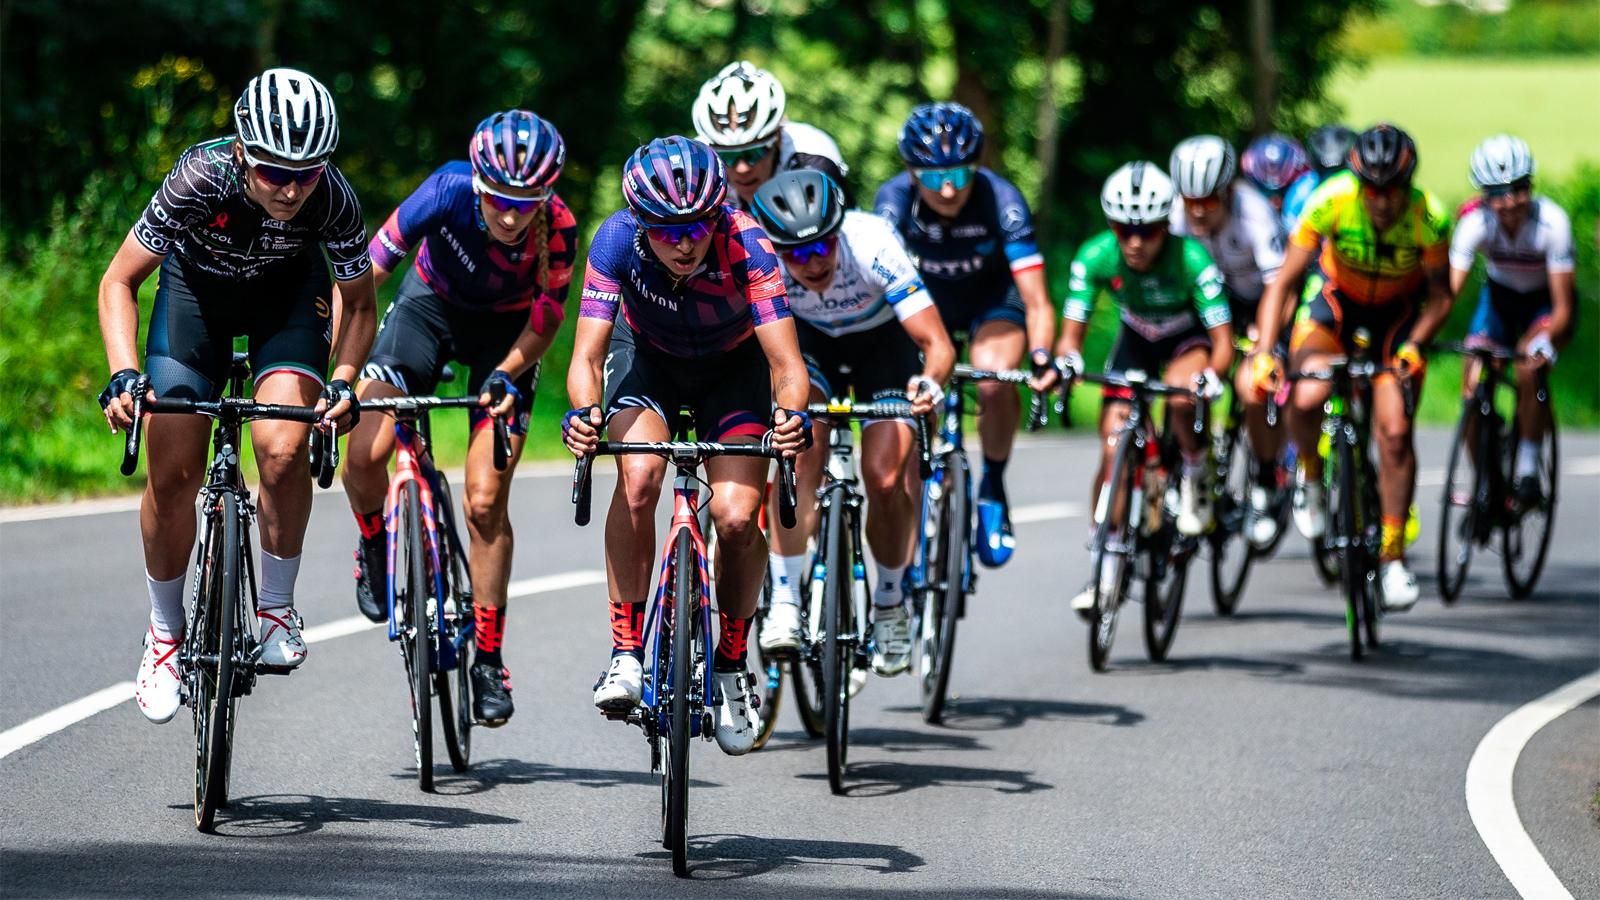 2019 OVO Energy Women's Tour Race Dates